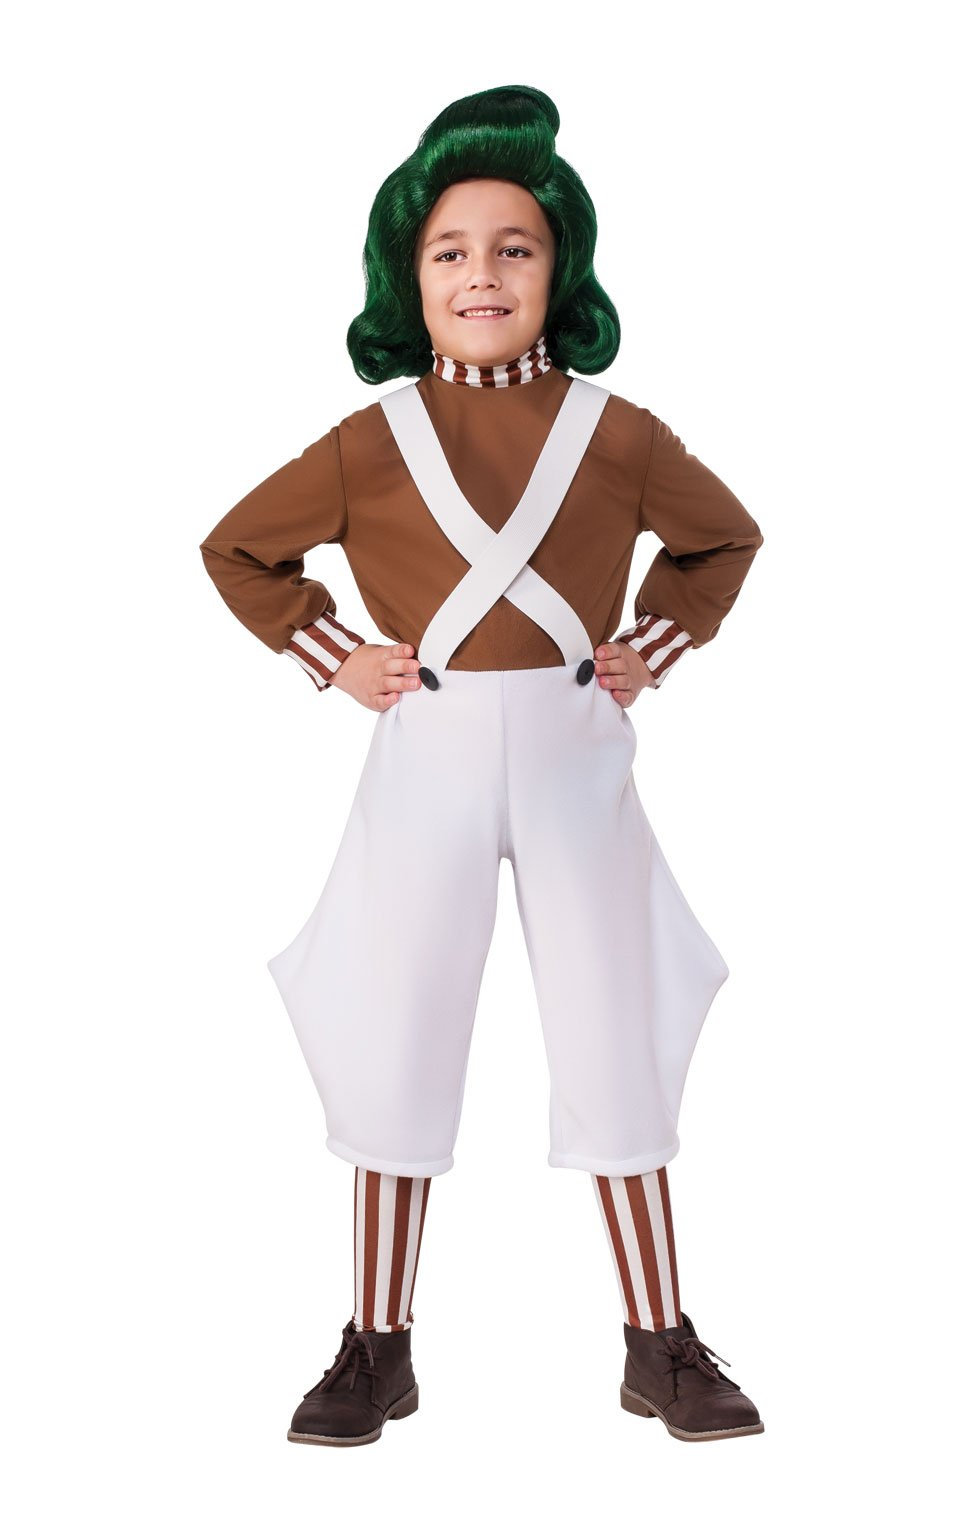 Rubie's Costume Kids Willy Wonka & The Chocolate Factory Oompa Loompa Value Costume, Medium